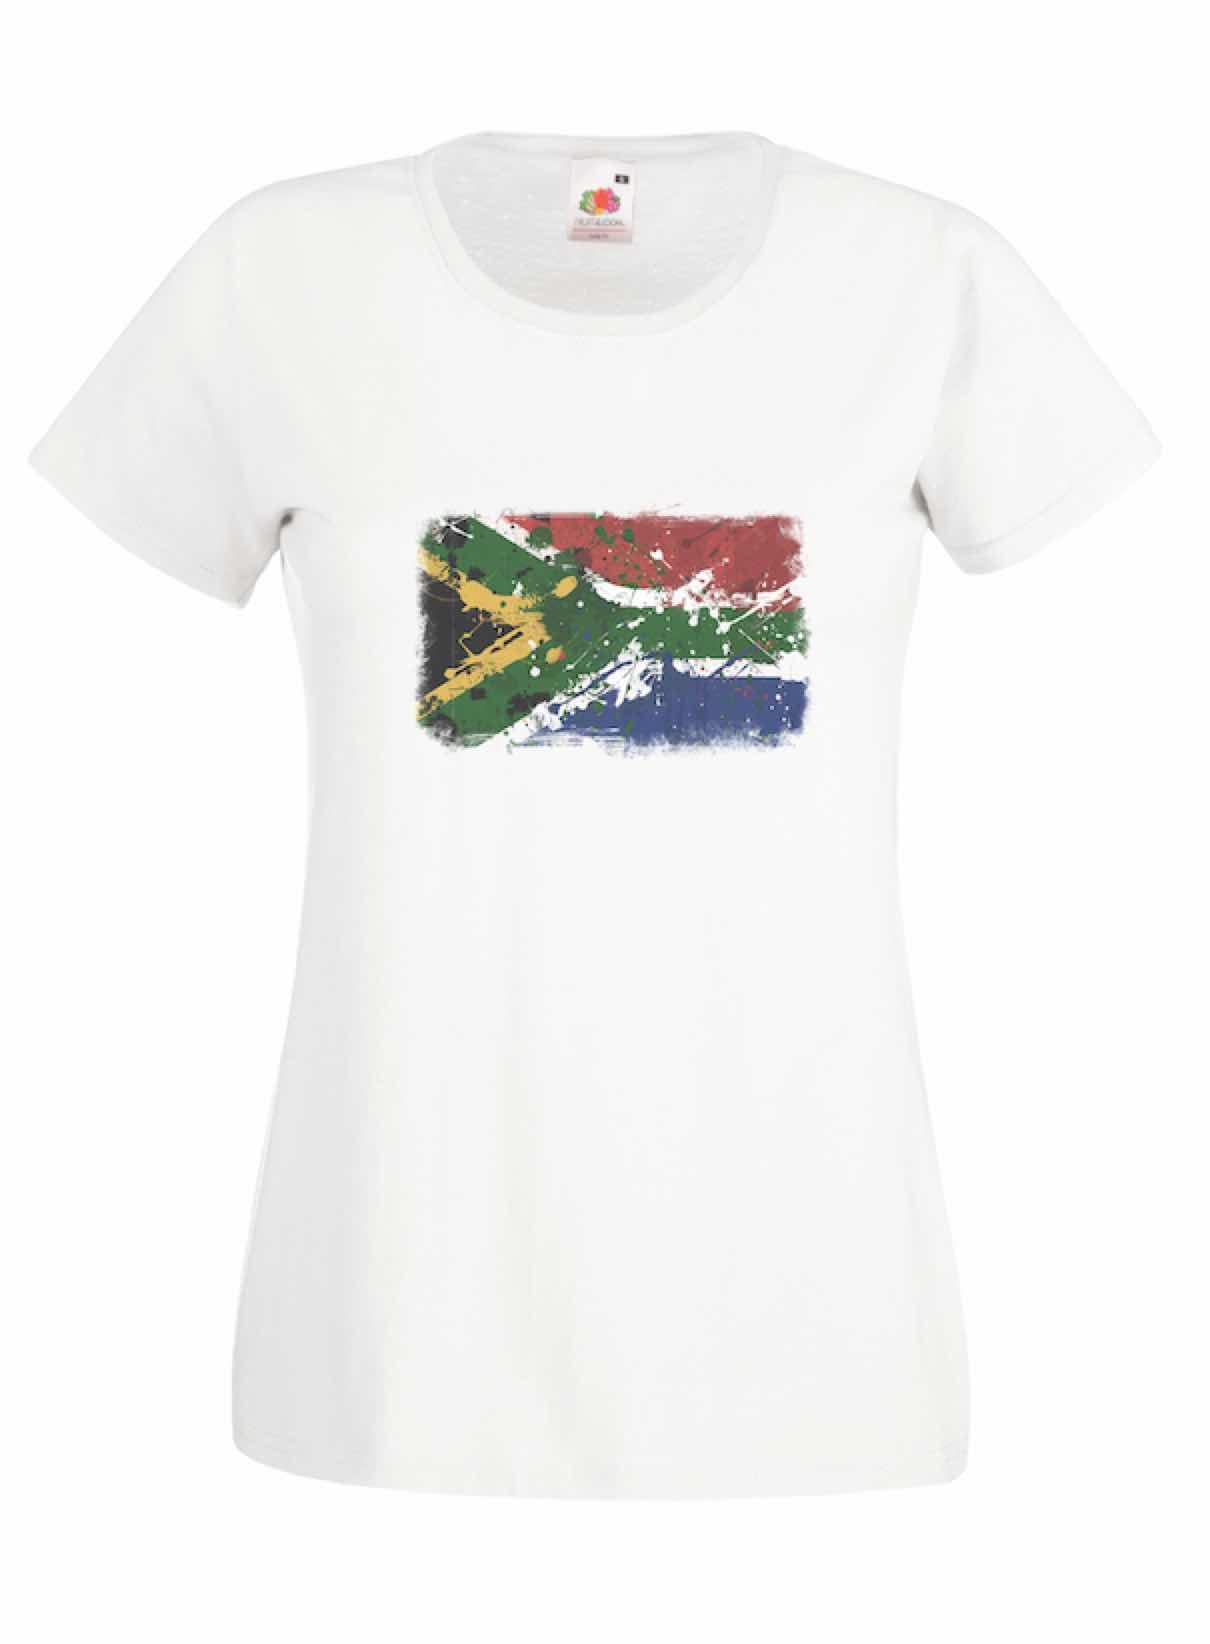 Flag Art design for t-shirt, hoodie & sweatshirt